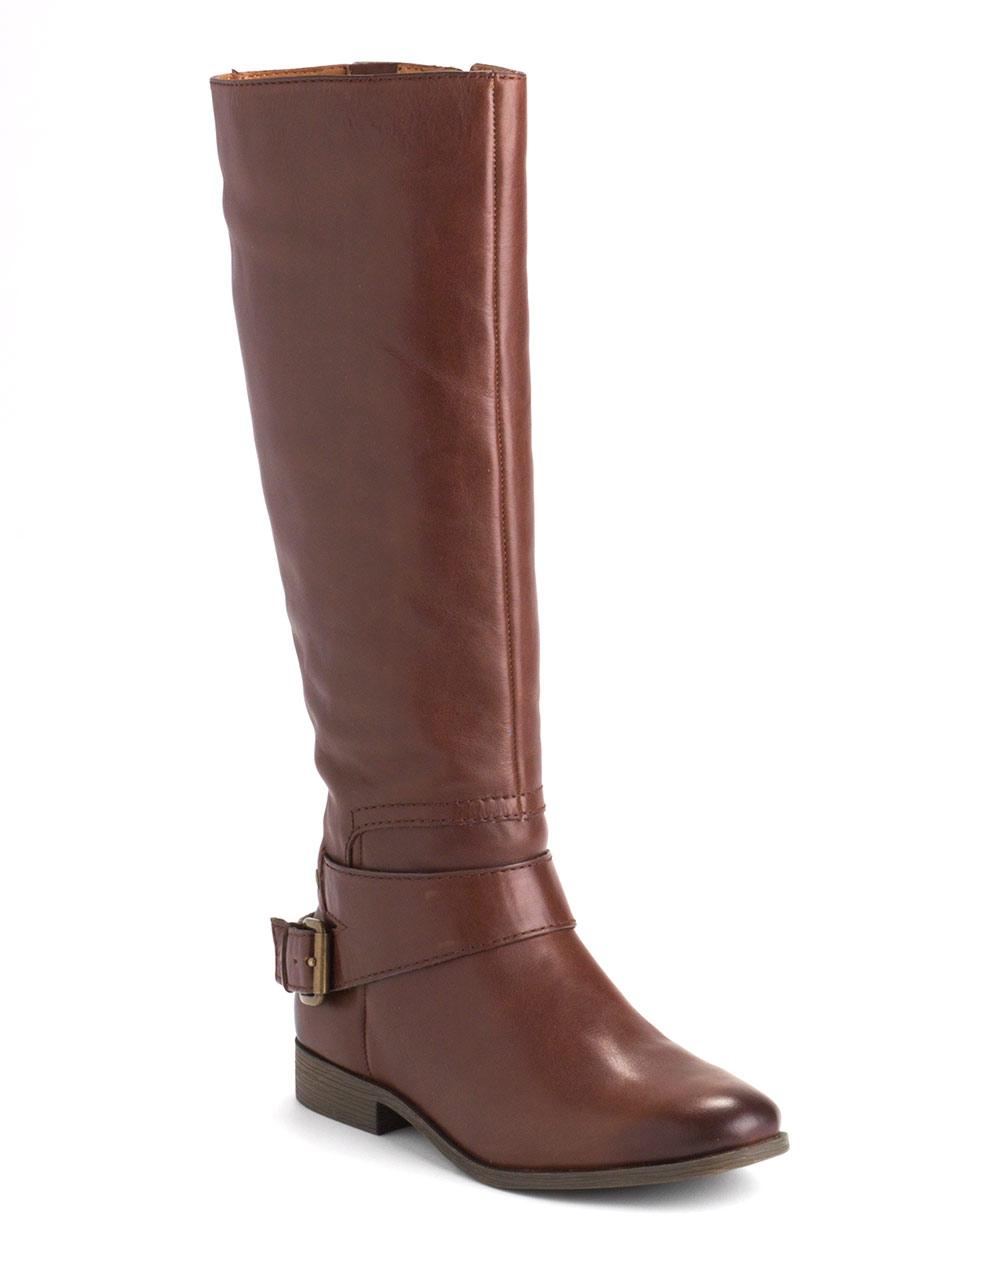 nine west tiptop leather boots in brown cognac